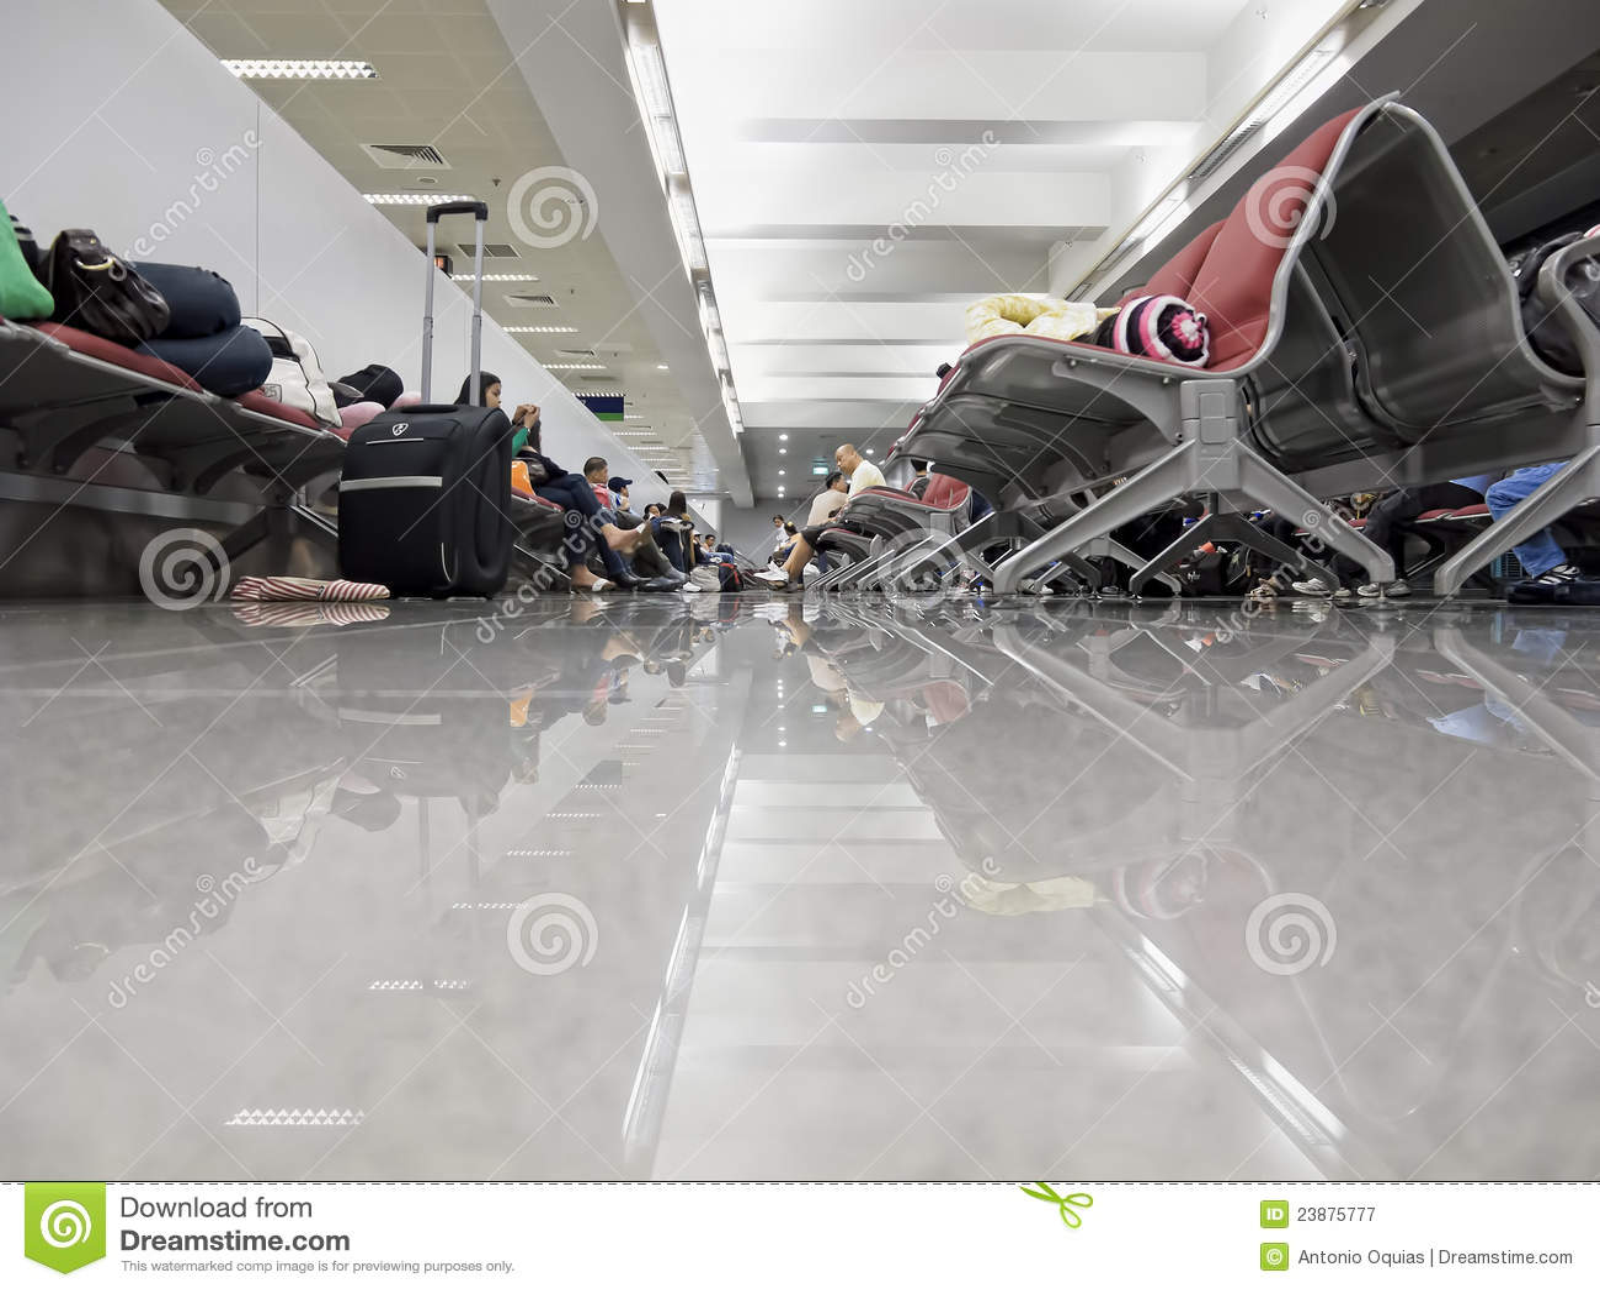 Weary Travelers